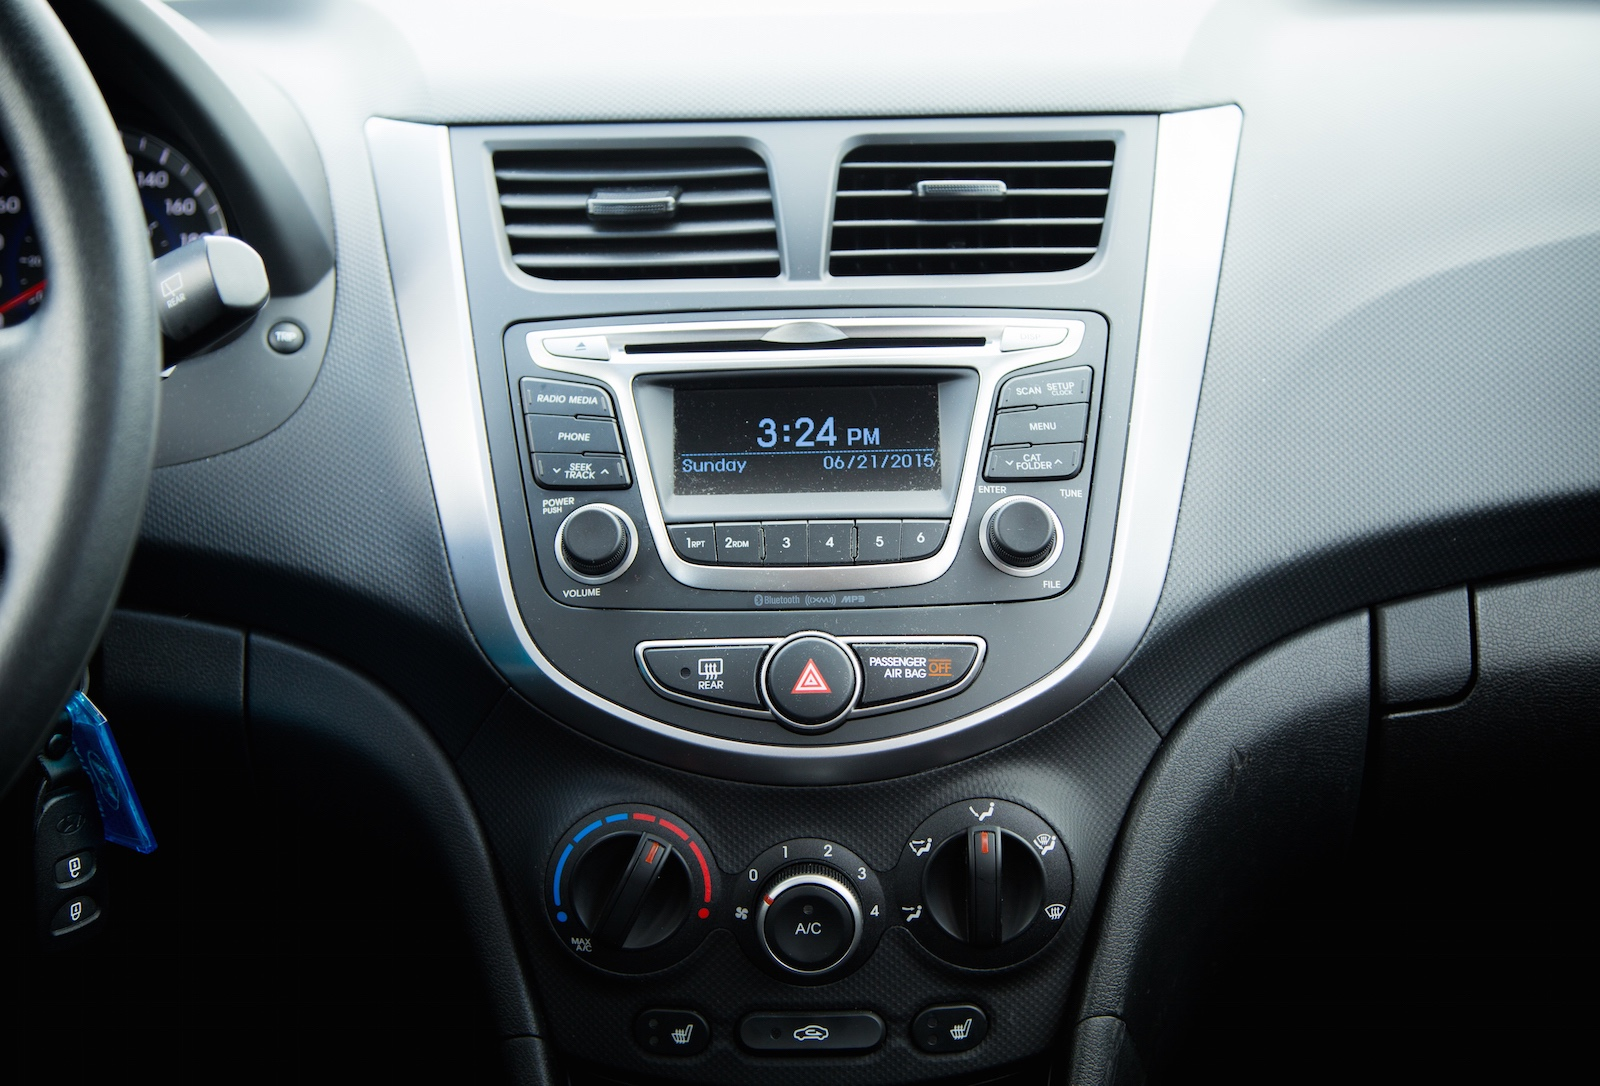 Review 2015 hyundai accent canadian auto review hyundai accent publicscrutiny Images